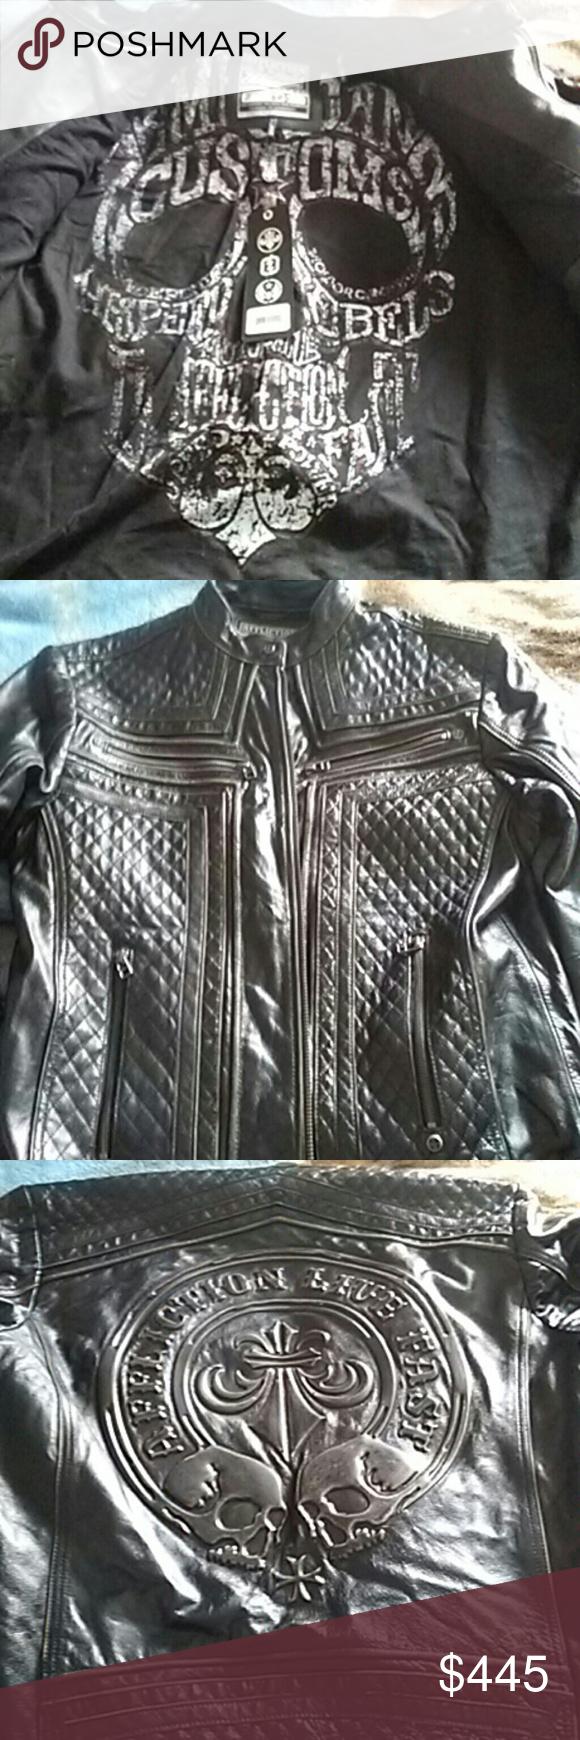 Affliction Leather Jacket Affliction, Leather jacket